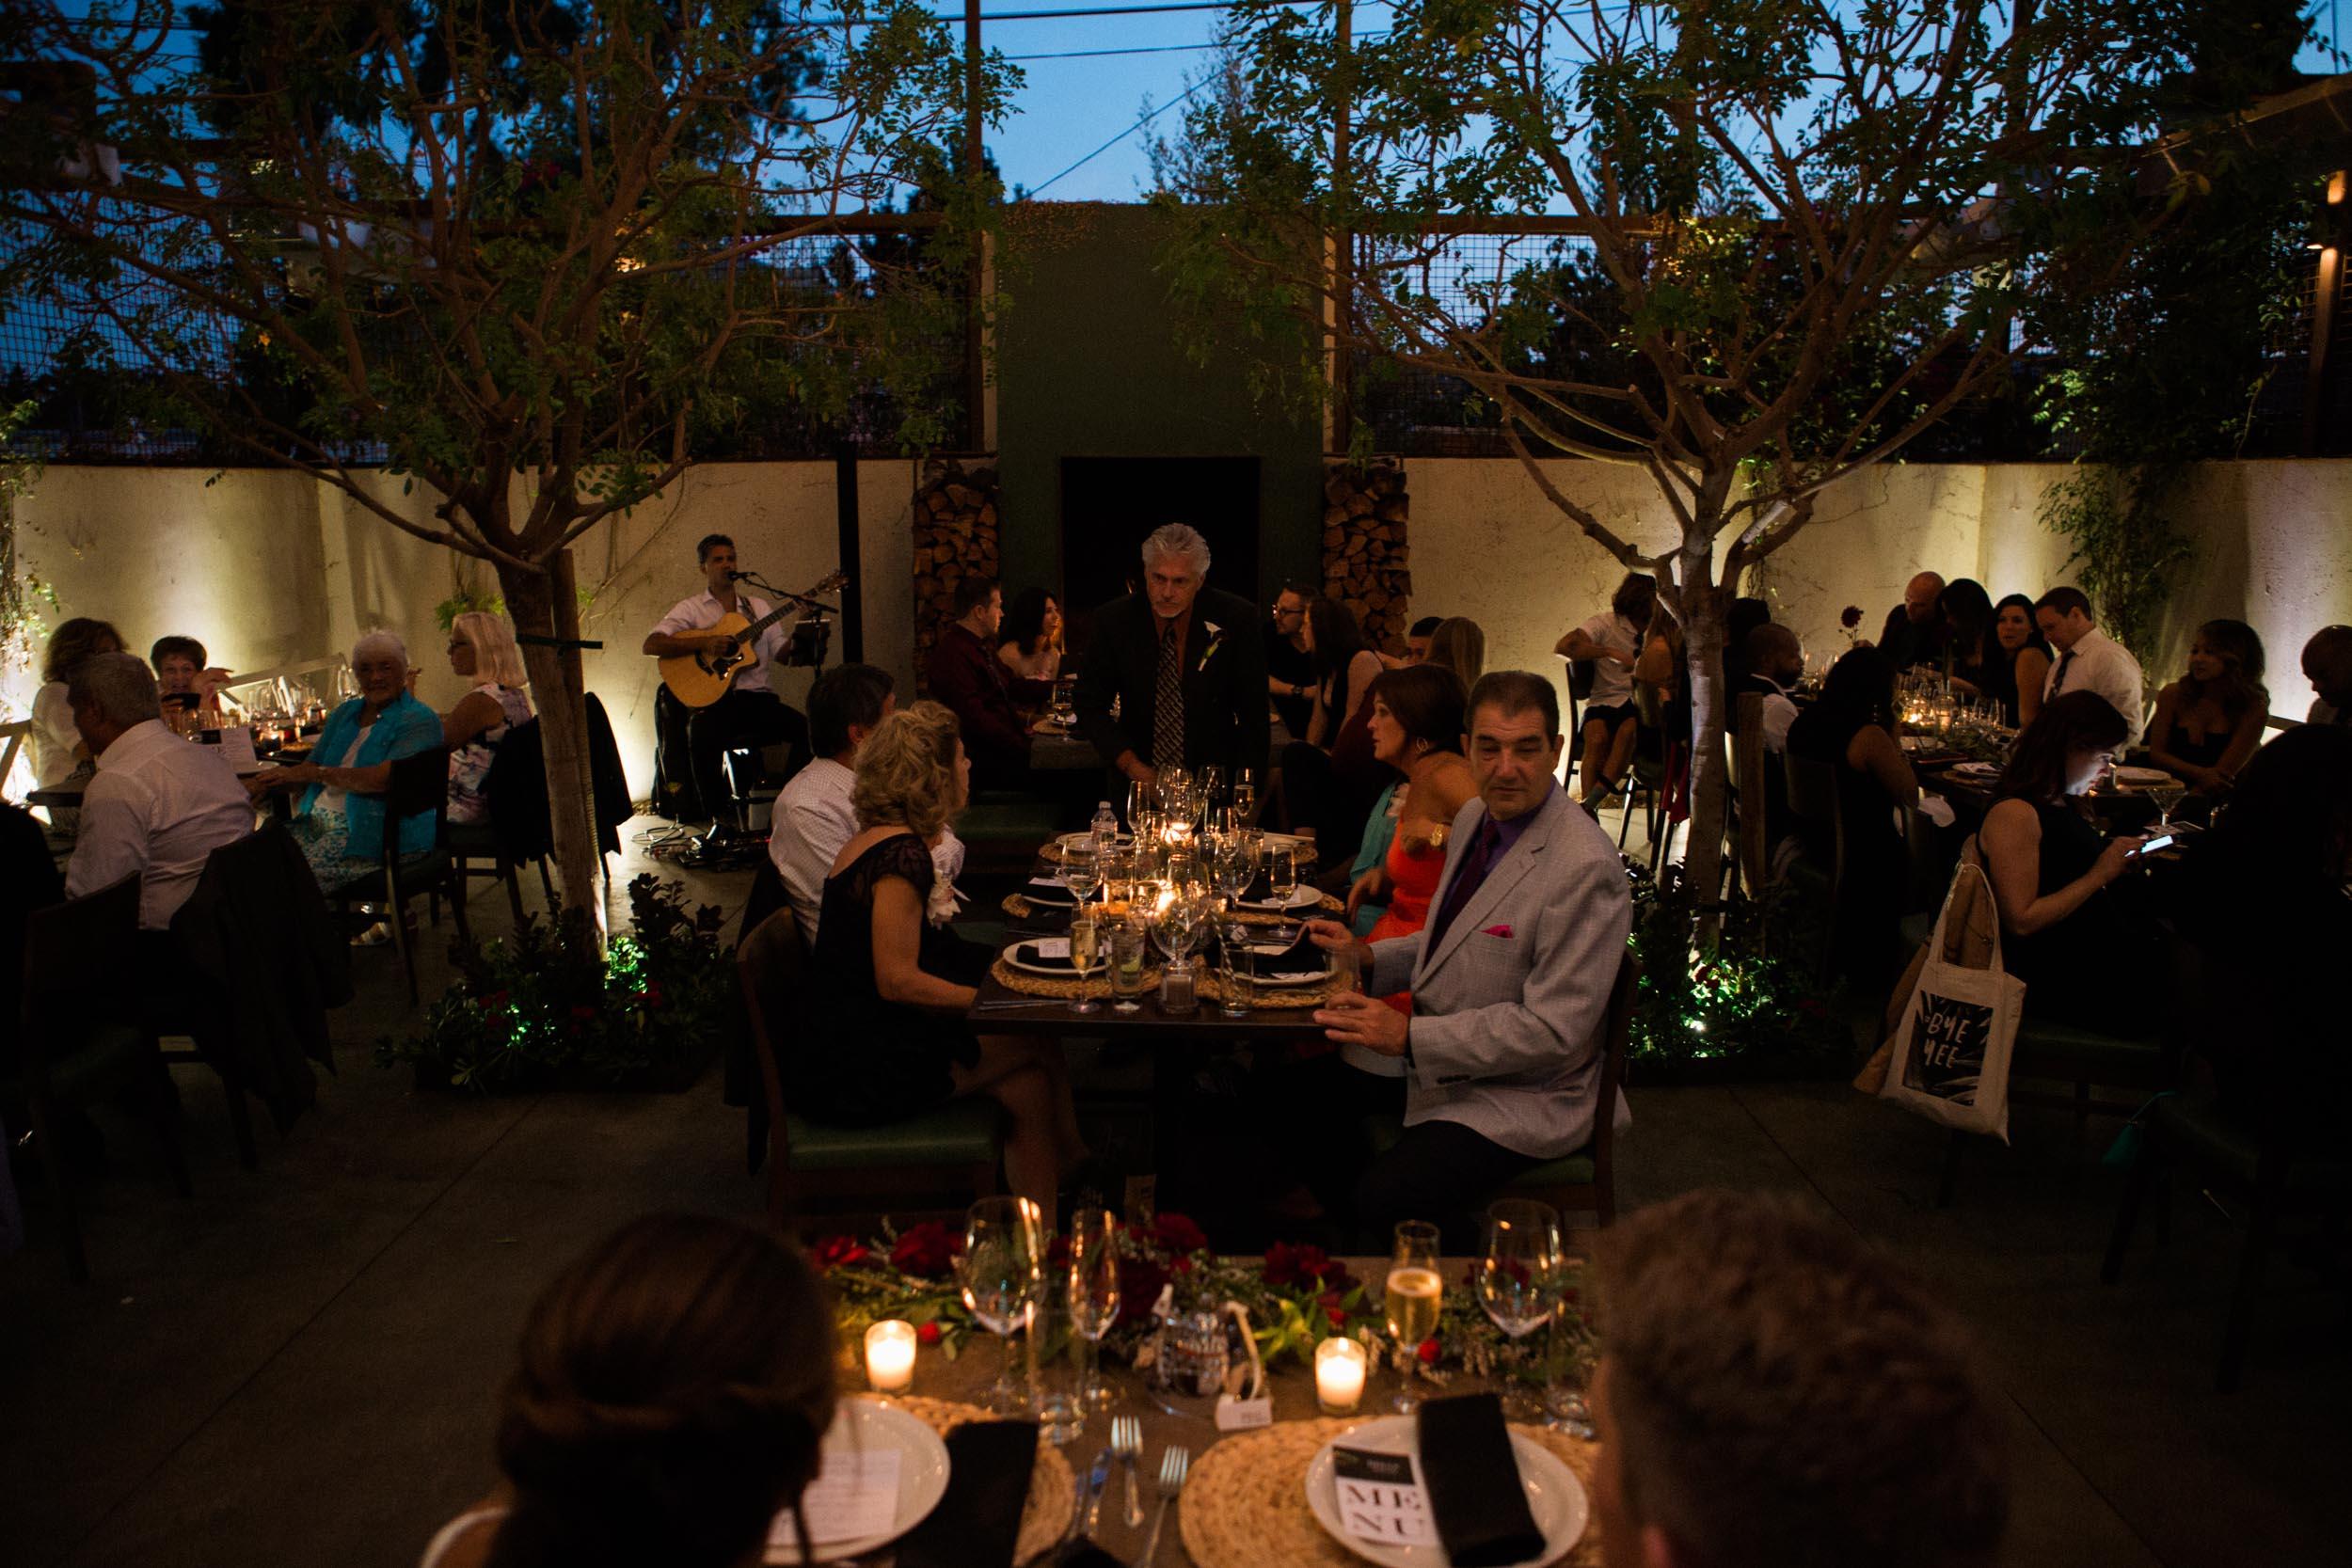 BKM-Photography-Highland-Park-Los-Angeles-Backyard-Wedding-0071.jpg